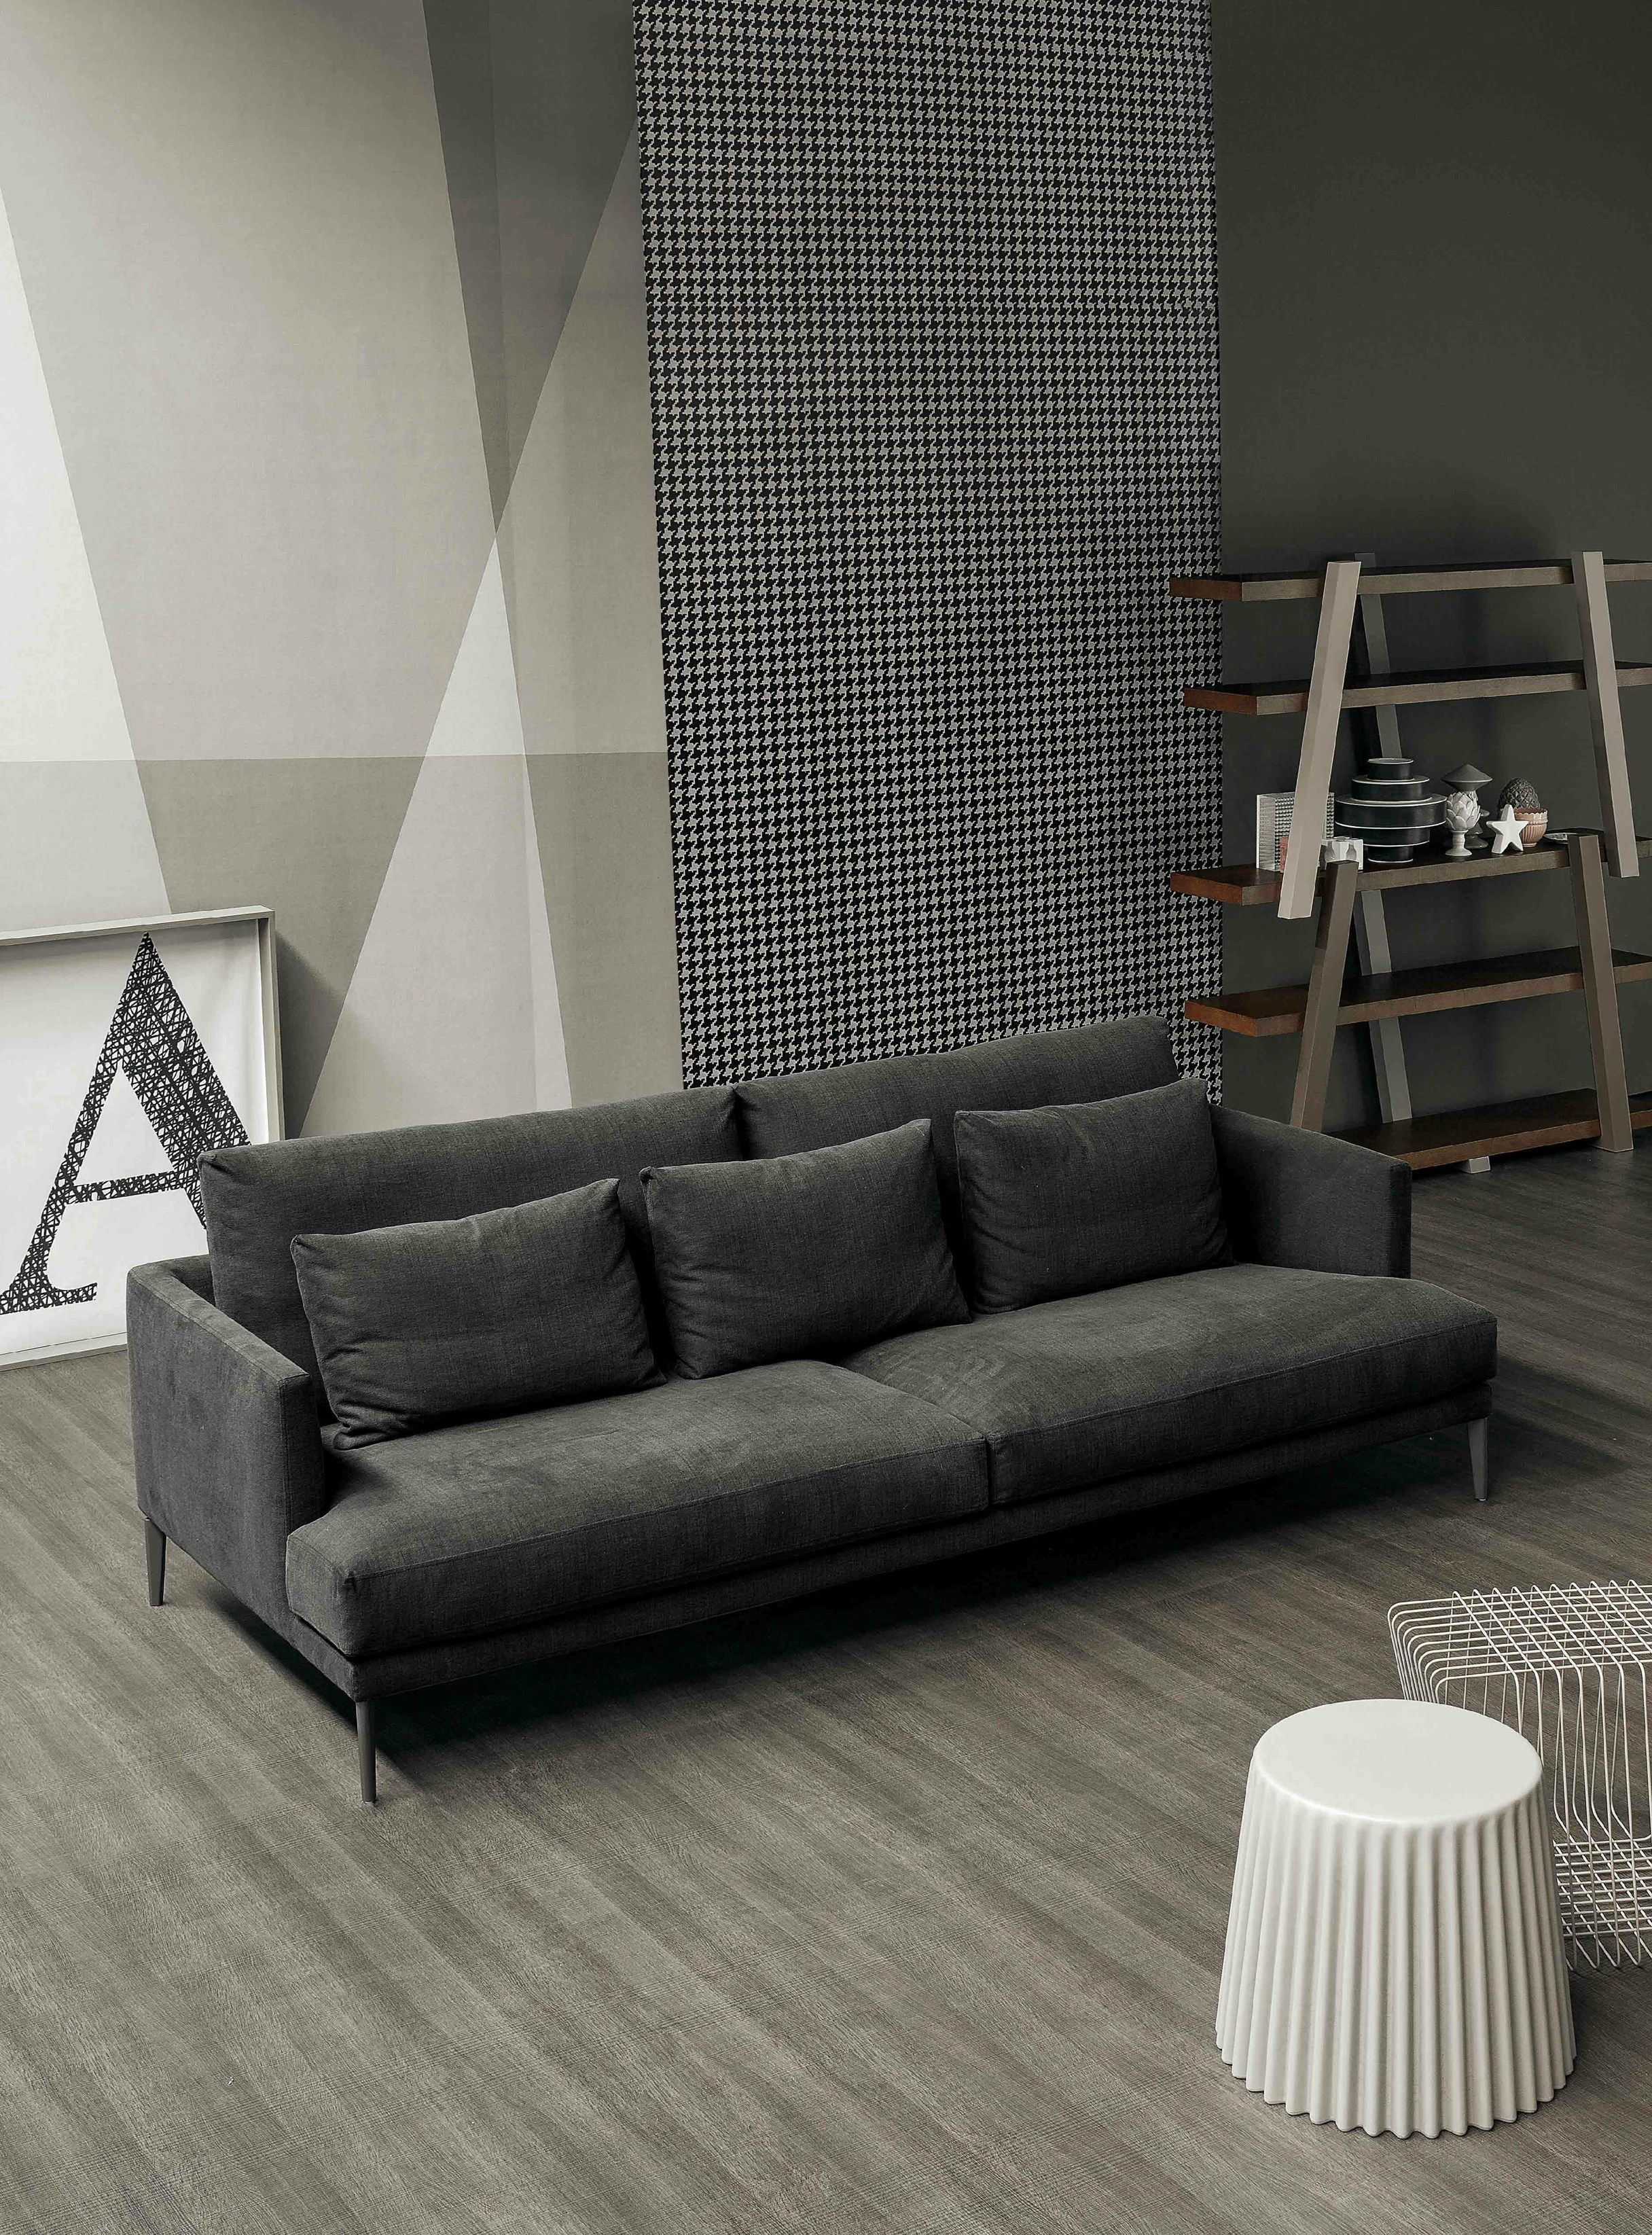 Sectional upholstered sofa paraiso collection by bonaldo design sergio bicego